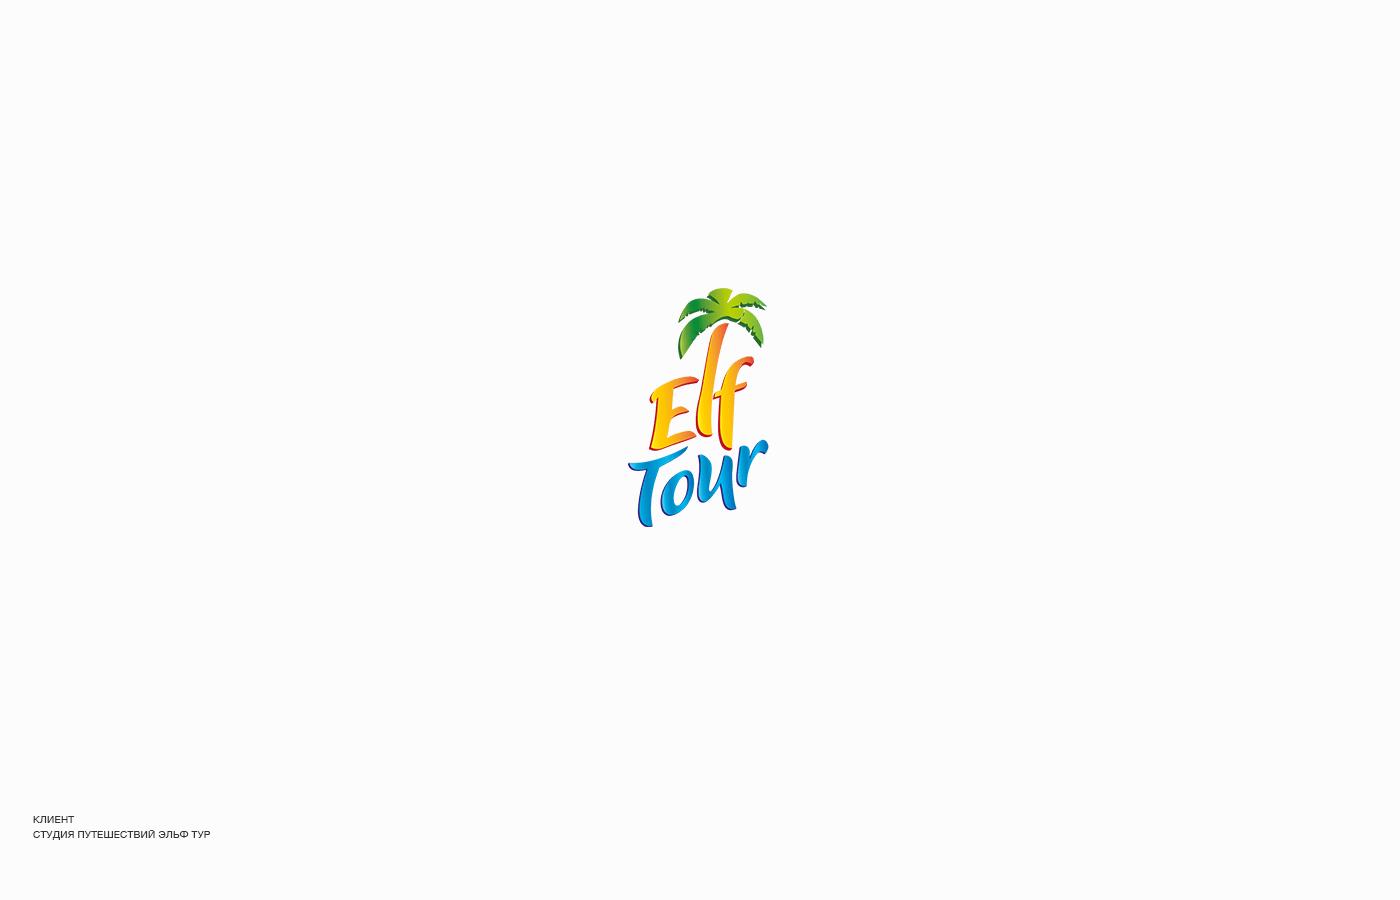 логотип, дизайн, спецтехника, бренд, брендинг, brand, logo, deisgn, turbion, туризм, путевки, лого